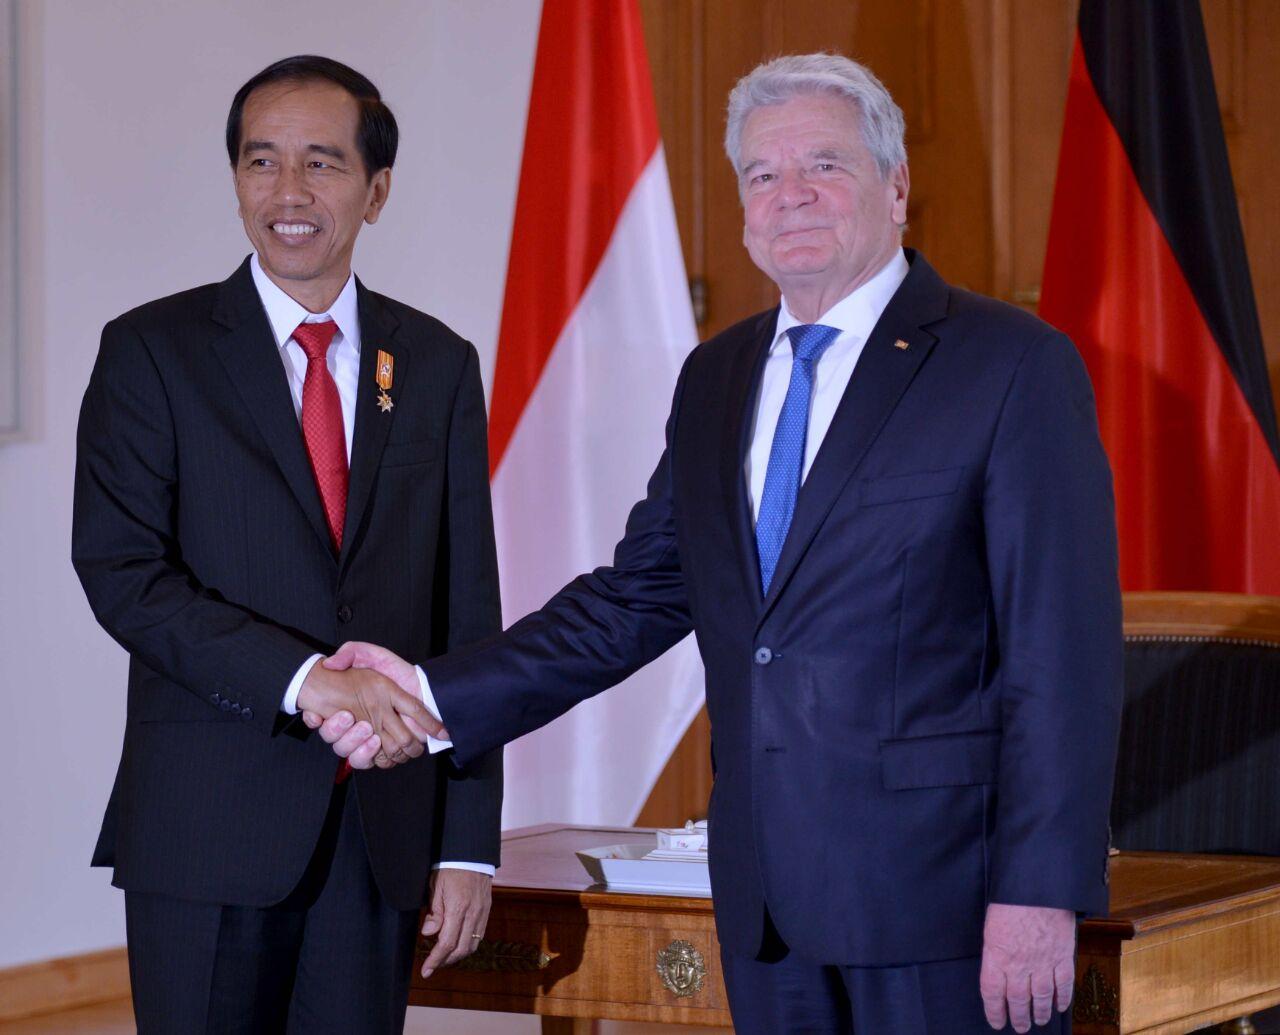 April 2016 sekretariat kabinet republik indonesia page 4 president jokowi meets german president 184 reheart Choice Image